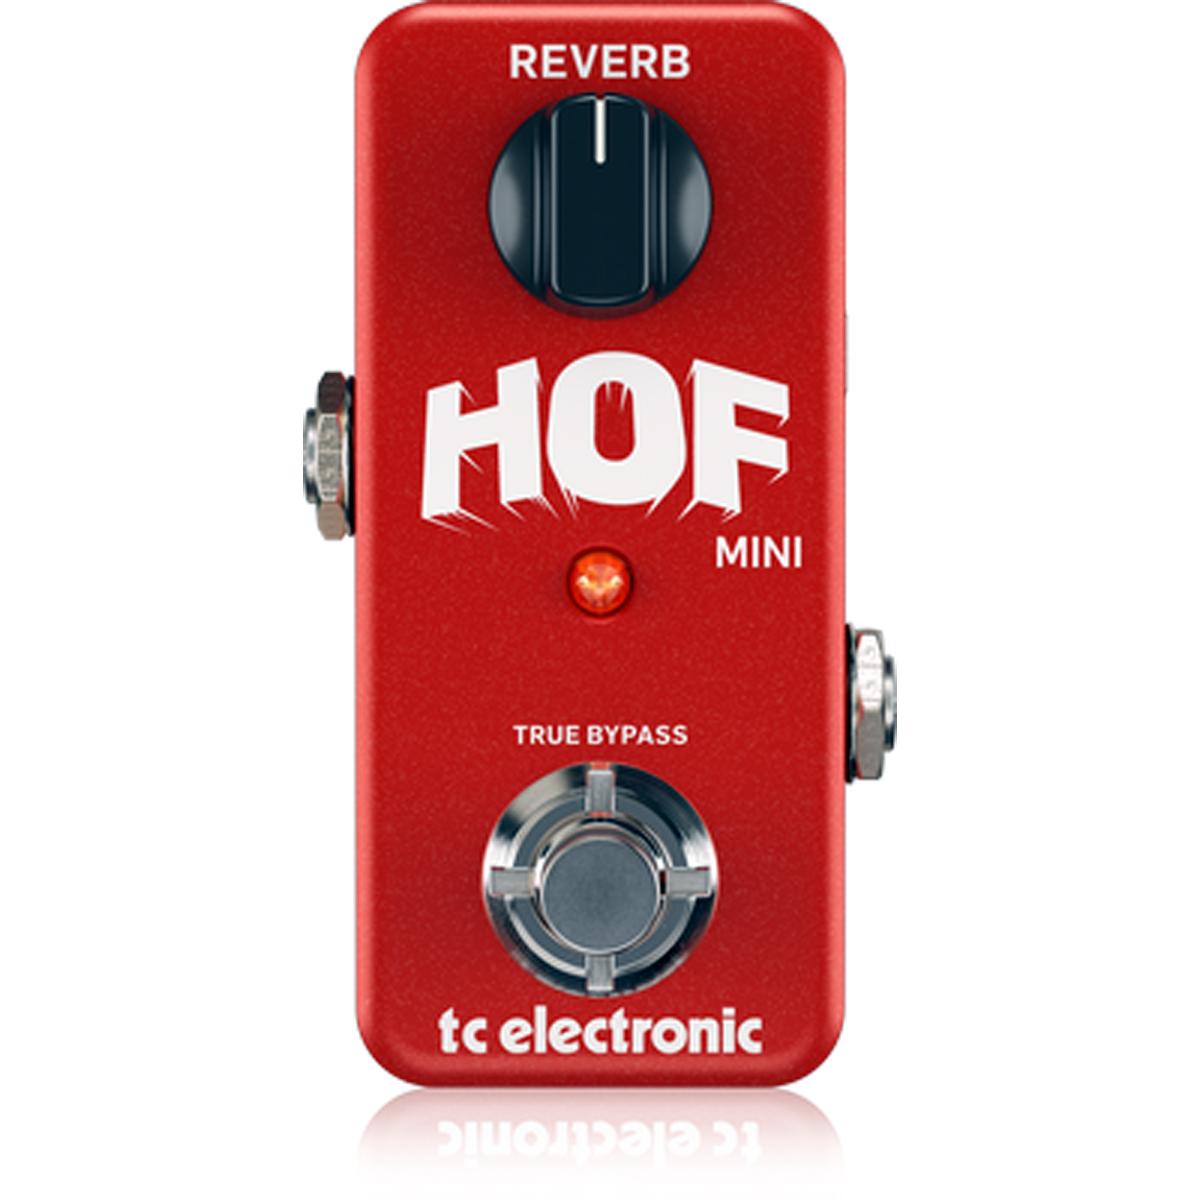 Hall Of Fame Mini Reverb : tc electronic hall of fame mini reverb pedal sonic circus ~ Hamham.info Haus und Dekorationen